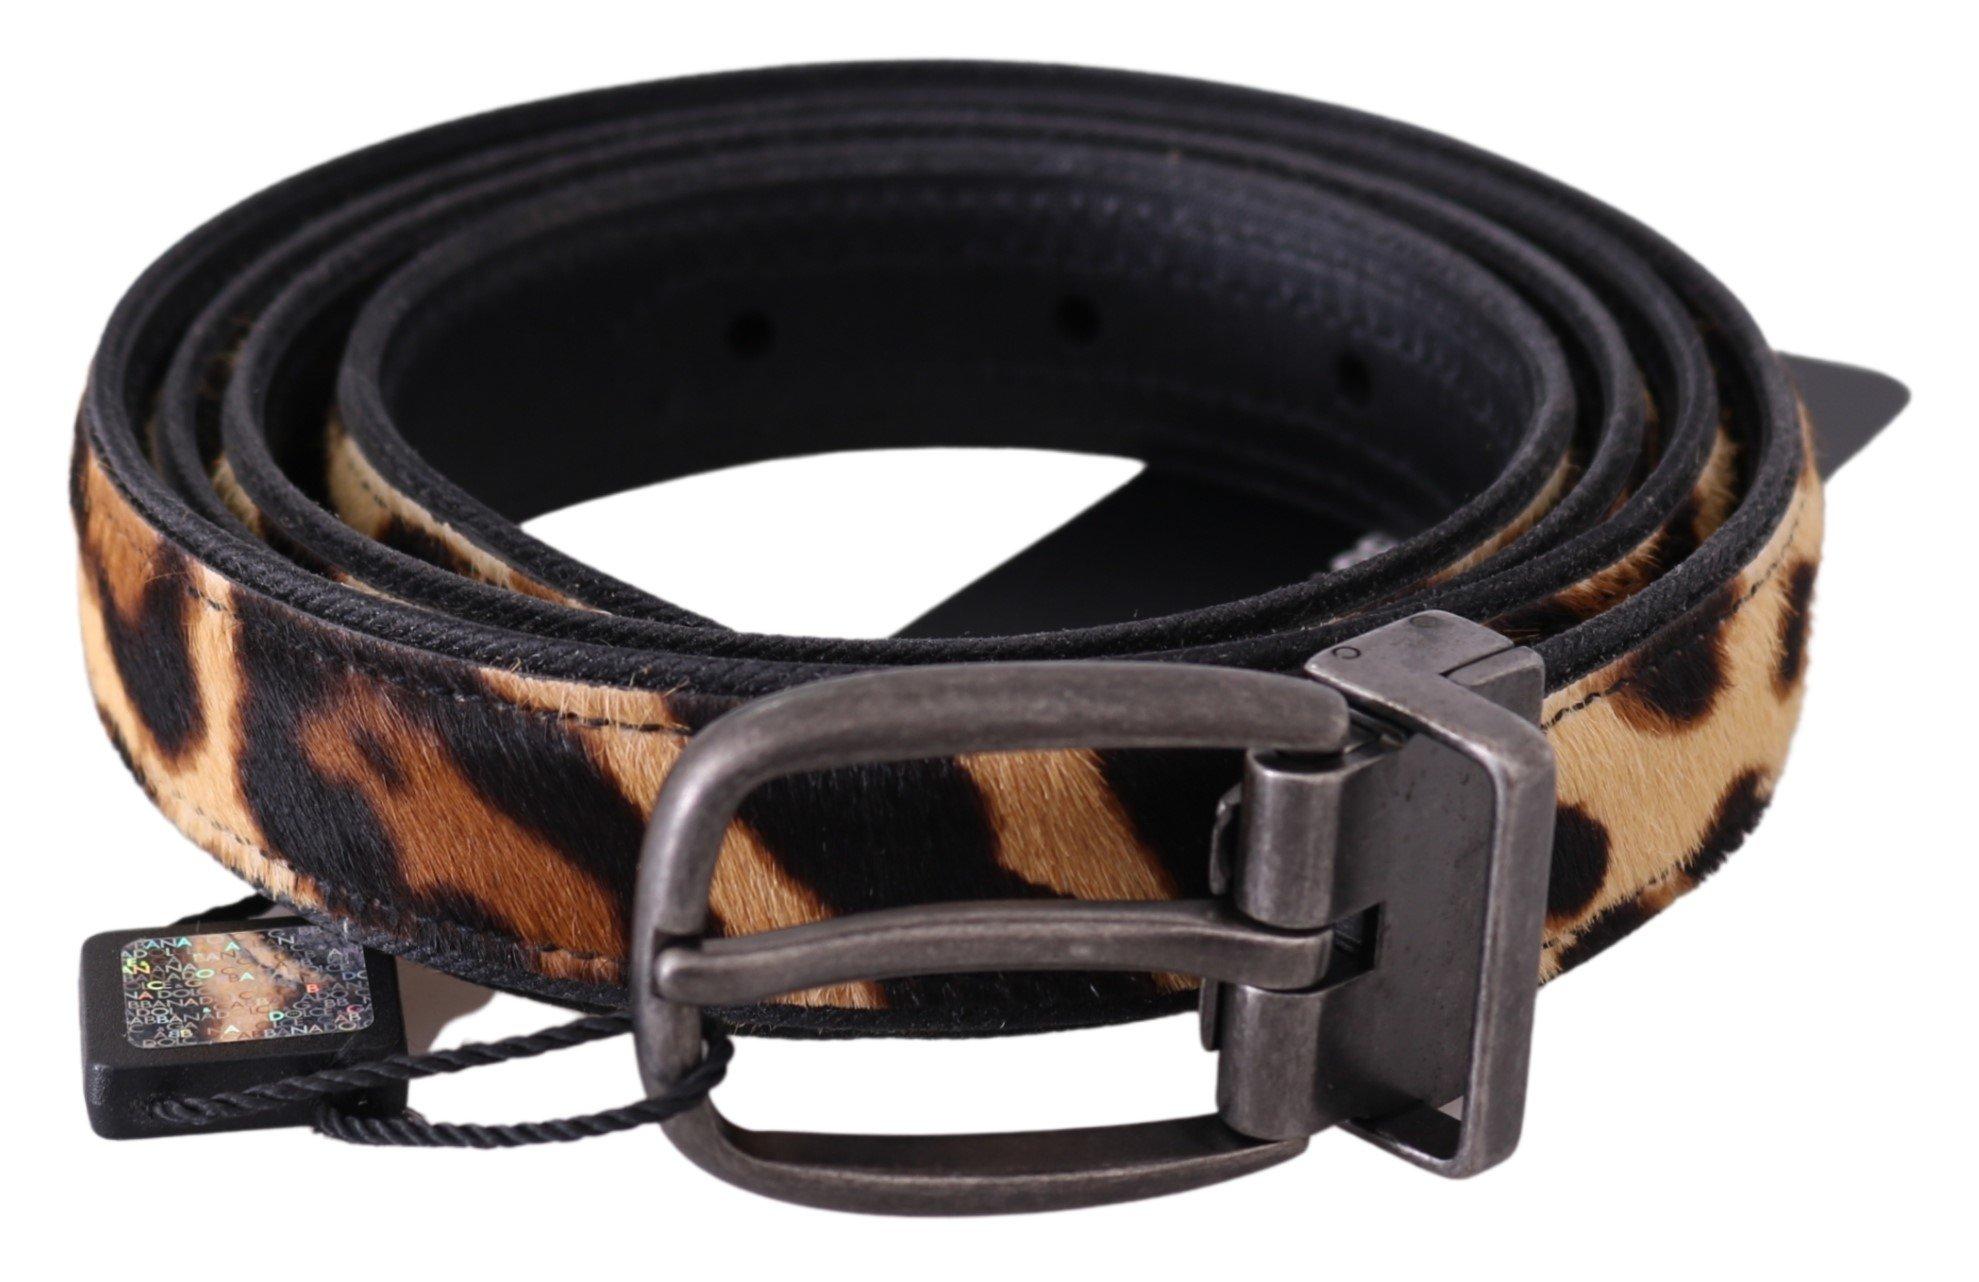 Dolce & Gabbana Women's Leopard Pattern Leather Belt Brown BEL60677 - 105 cm / 42 Inches